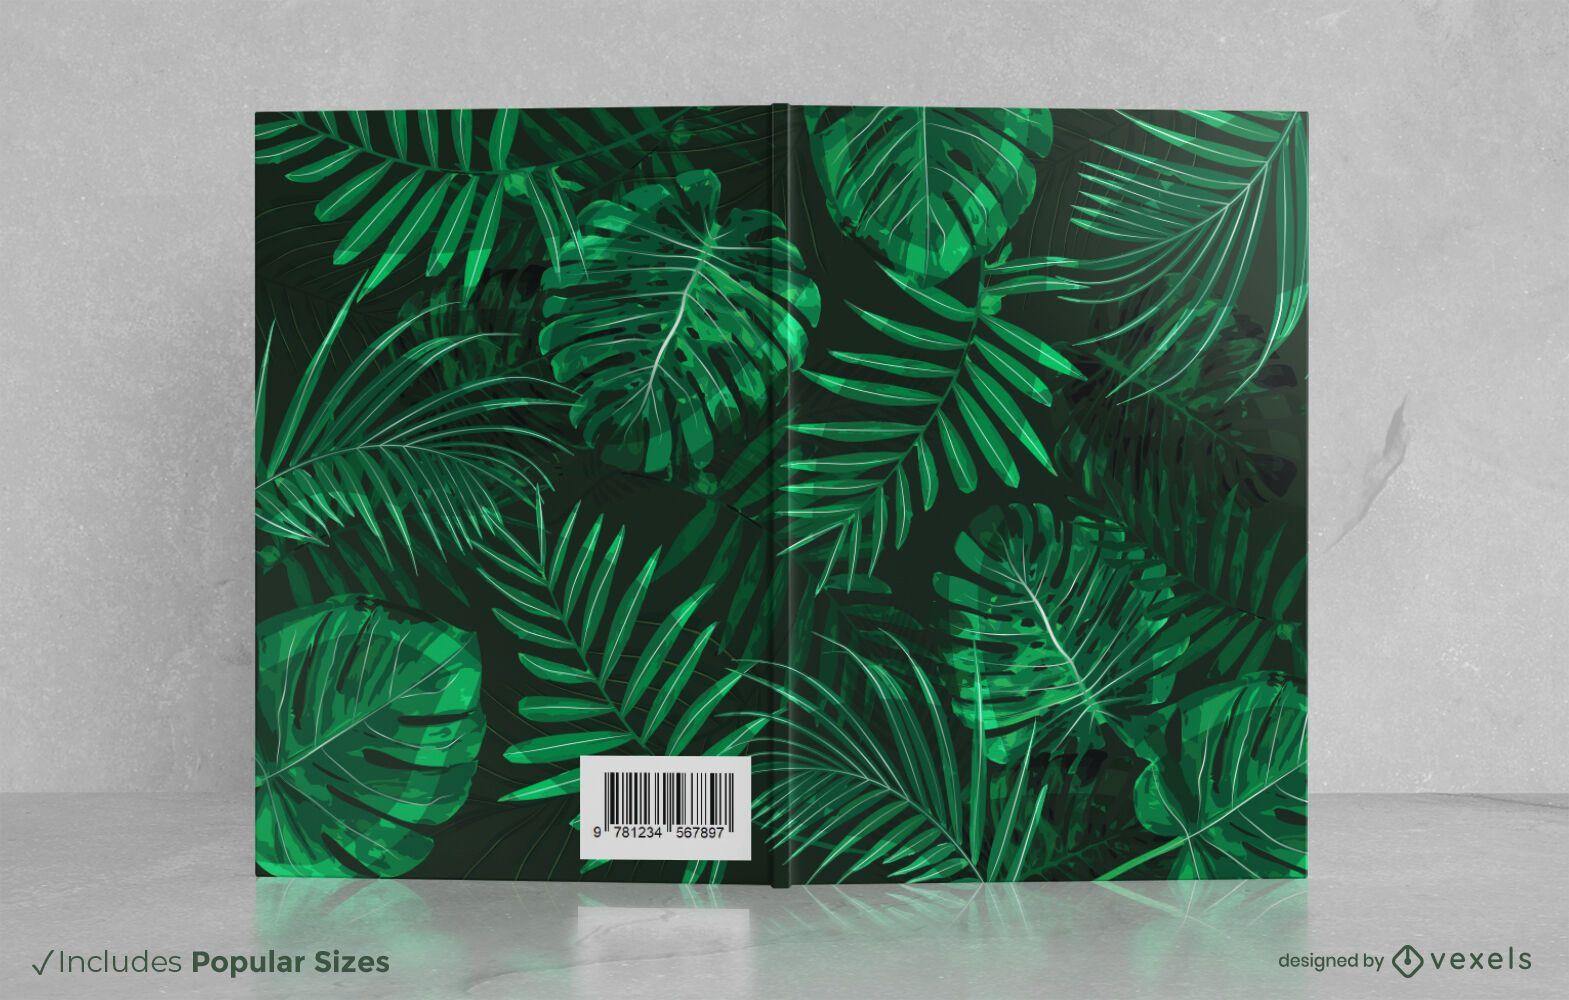 Dise?o de portada de libro de hojas tropicales